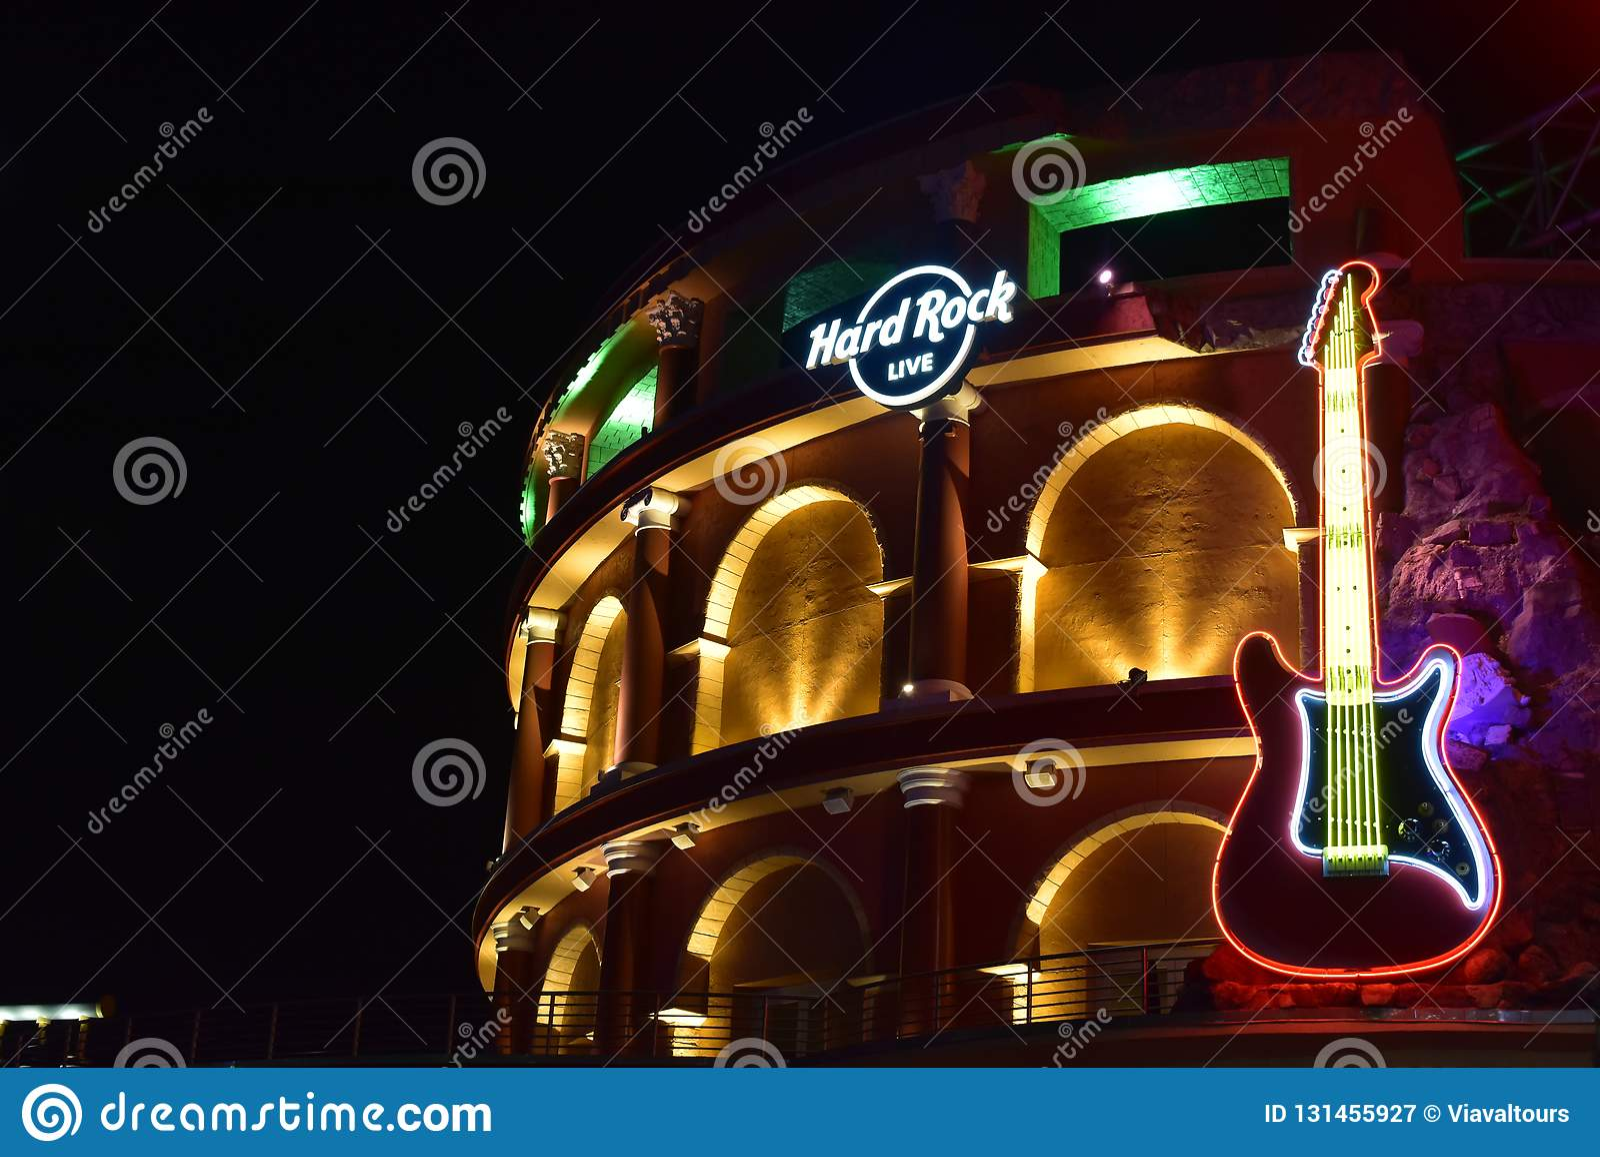 Hard Rock gitara na Romańskim kolosseumu i znak projektujemy budynek przy Universal Studios Citywalk